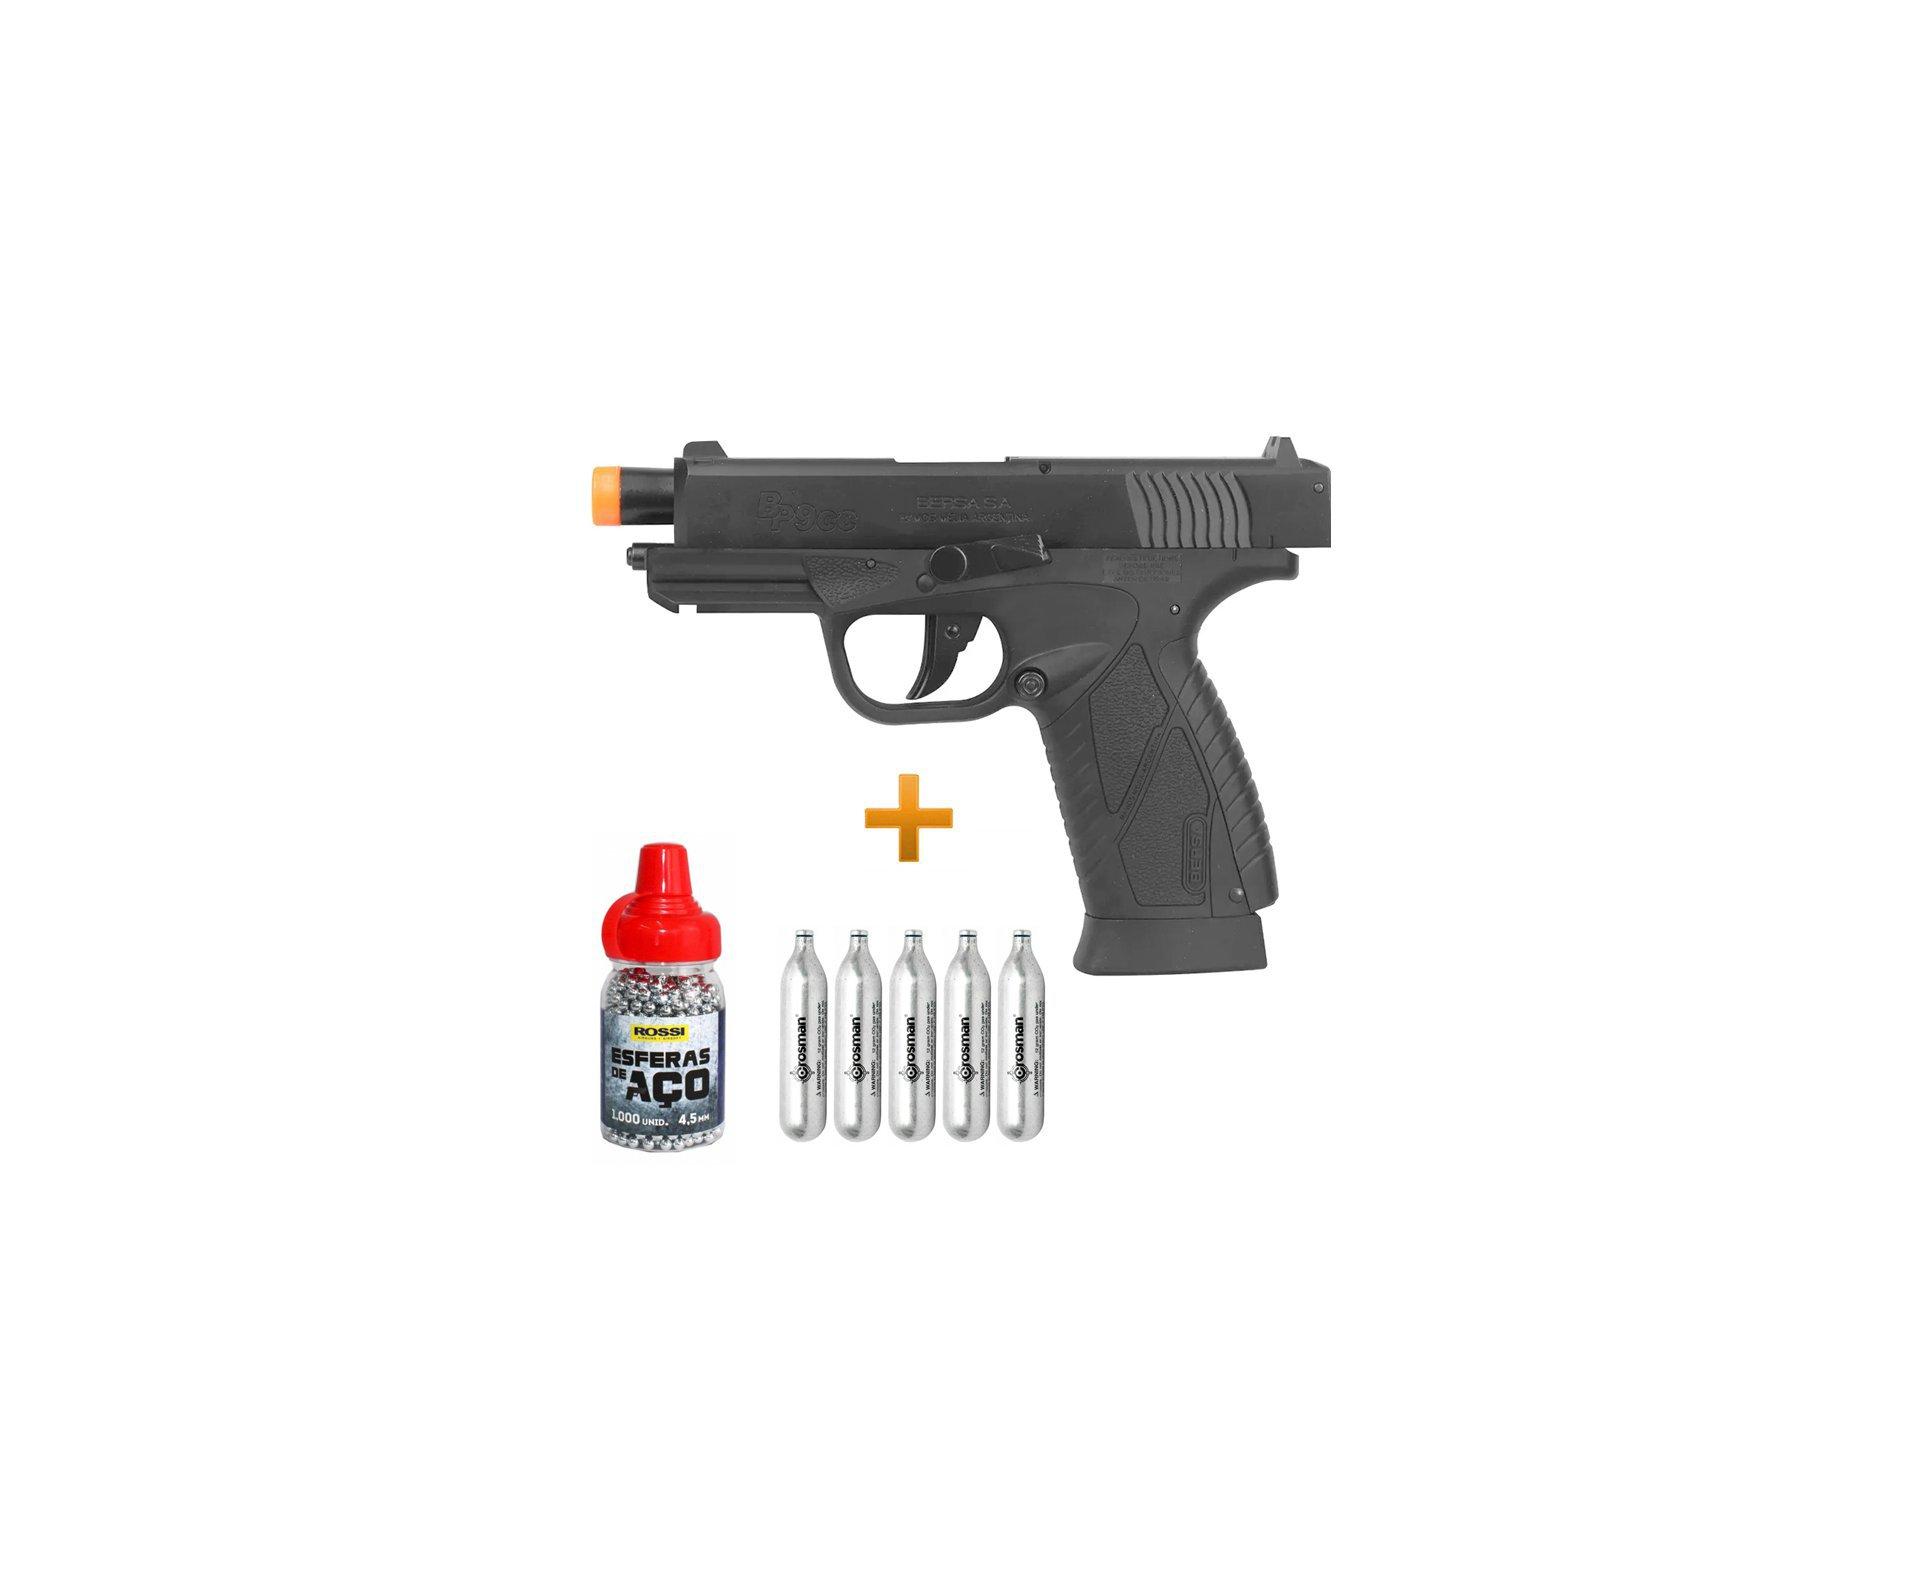 Pistola Pressão Co2 Asg Bersa Bp9cc Blowback 4,5 + Co2 12g + Esfera Aço